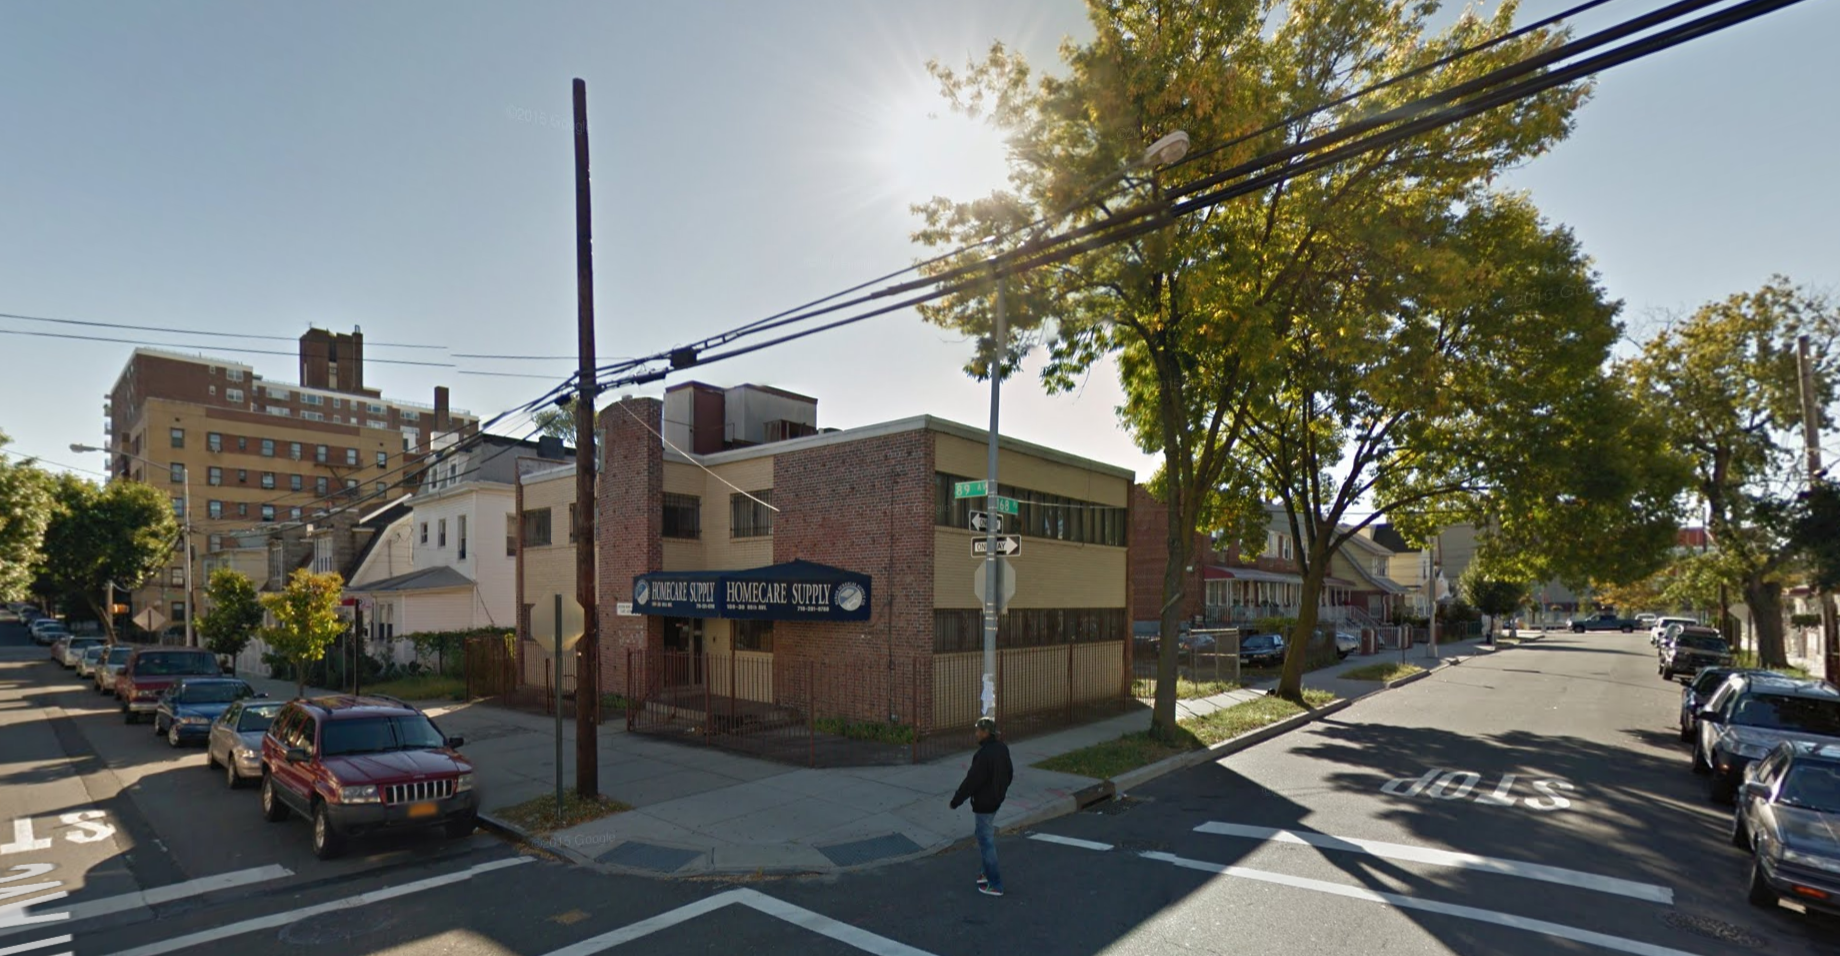 168-30 89th Avenue, image via Google Maps